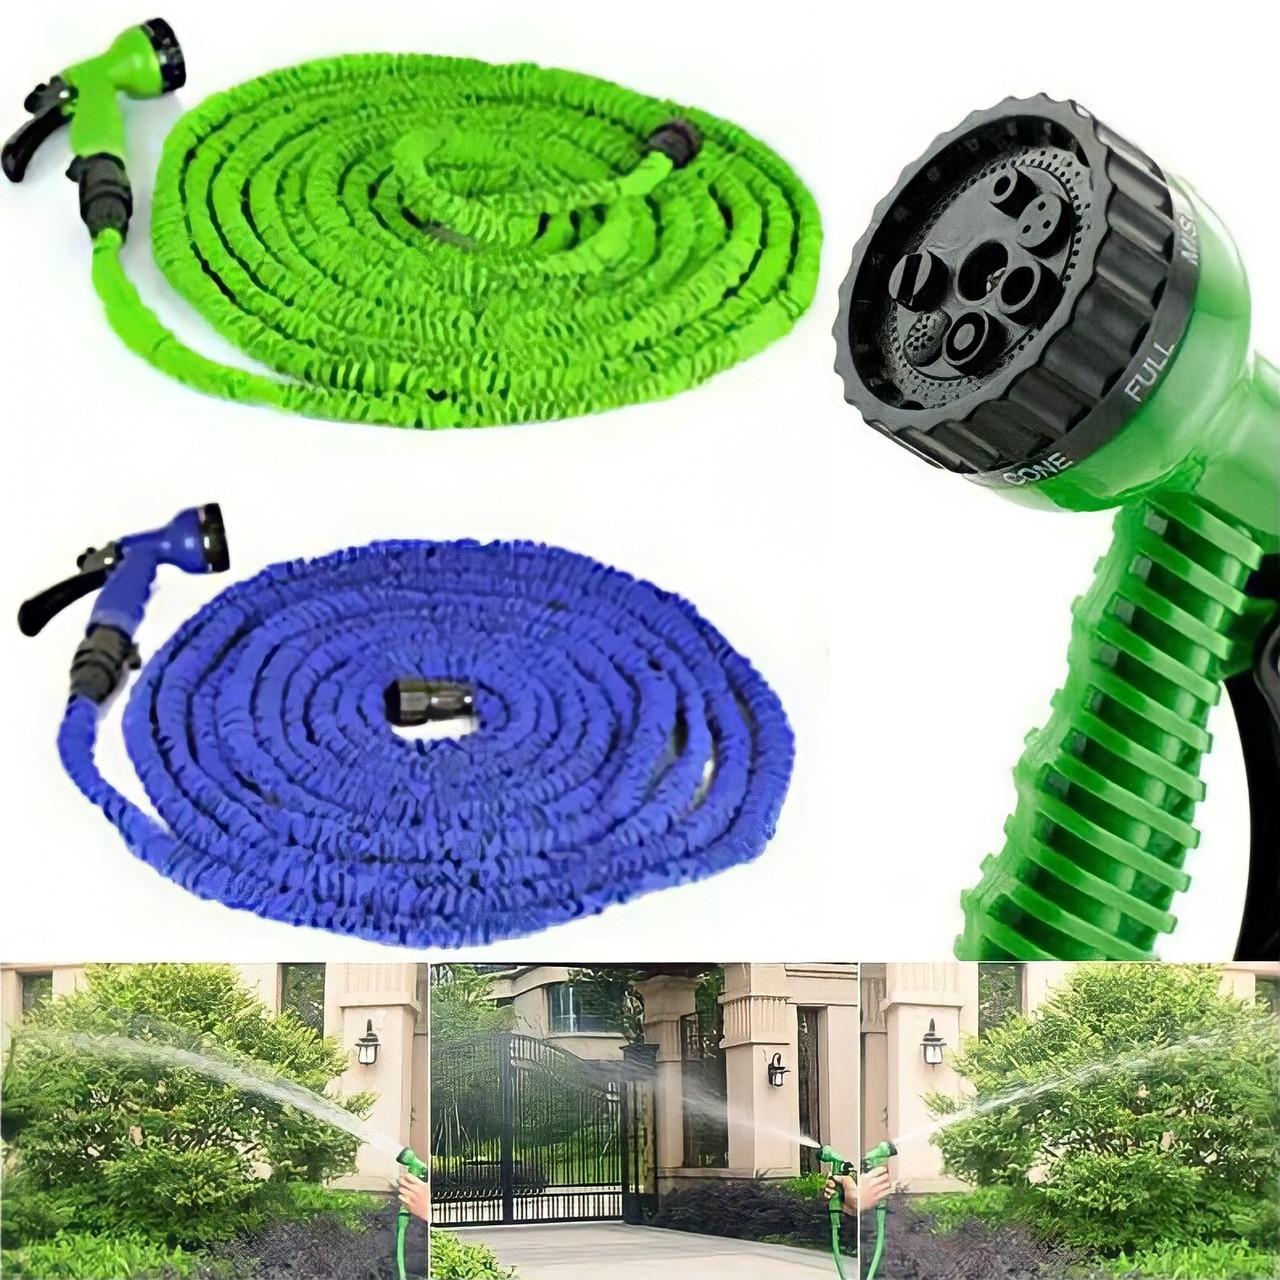 Шланг поливальний X-hose для саду 60 м | xhose шланг для поливу